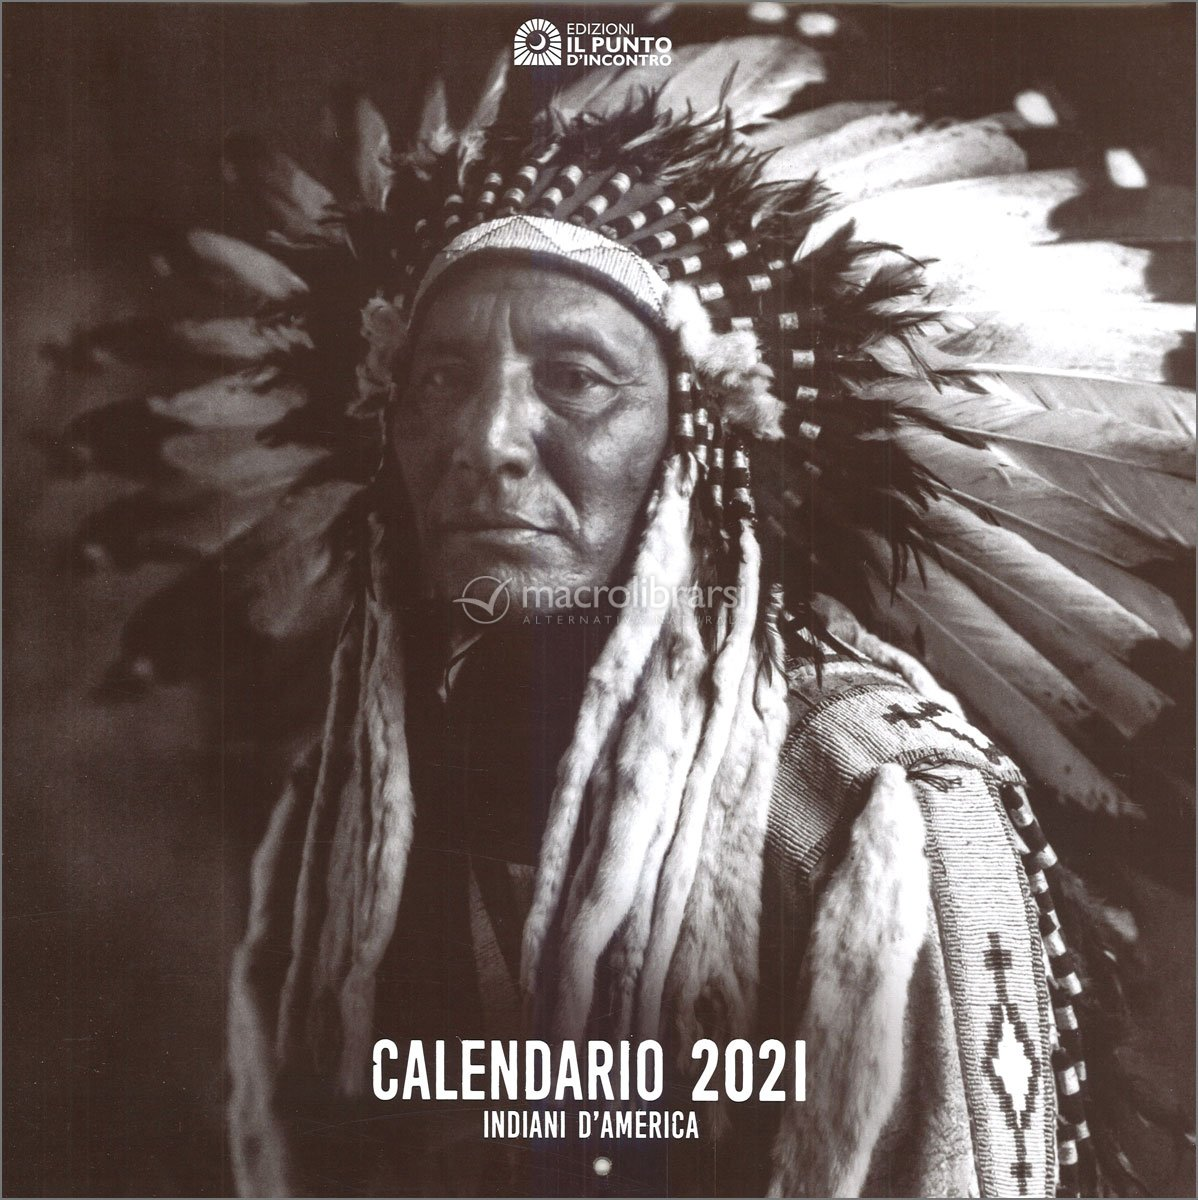 Calendario Pellerossa 2021 Calendario degli Indiani d'America 2021 — Calendario